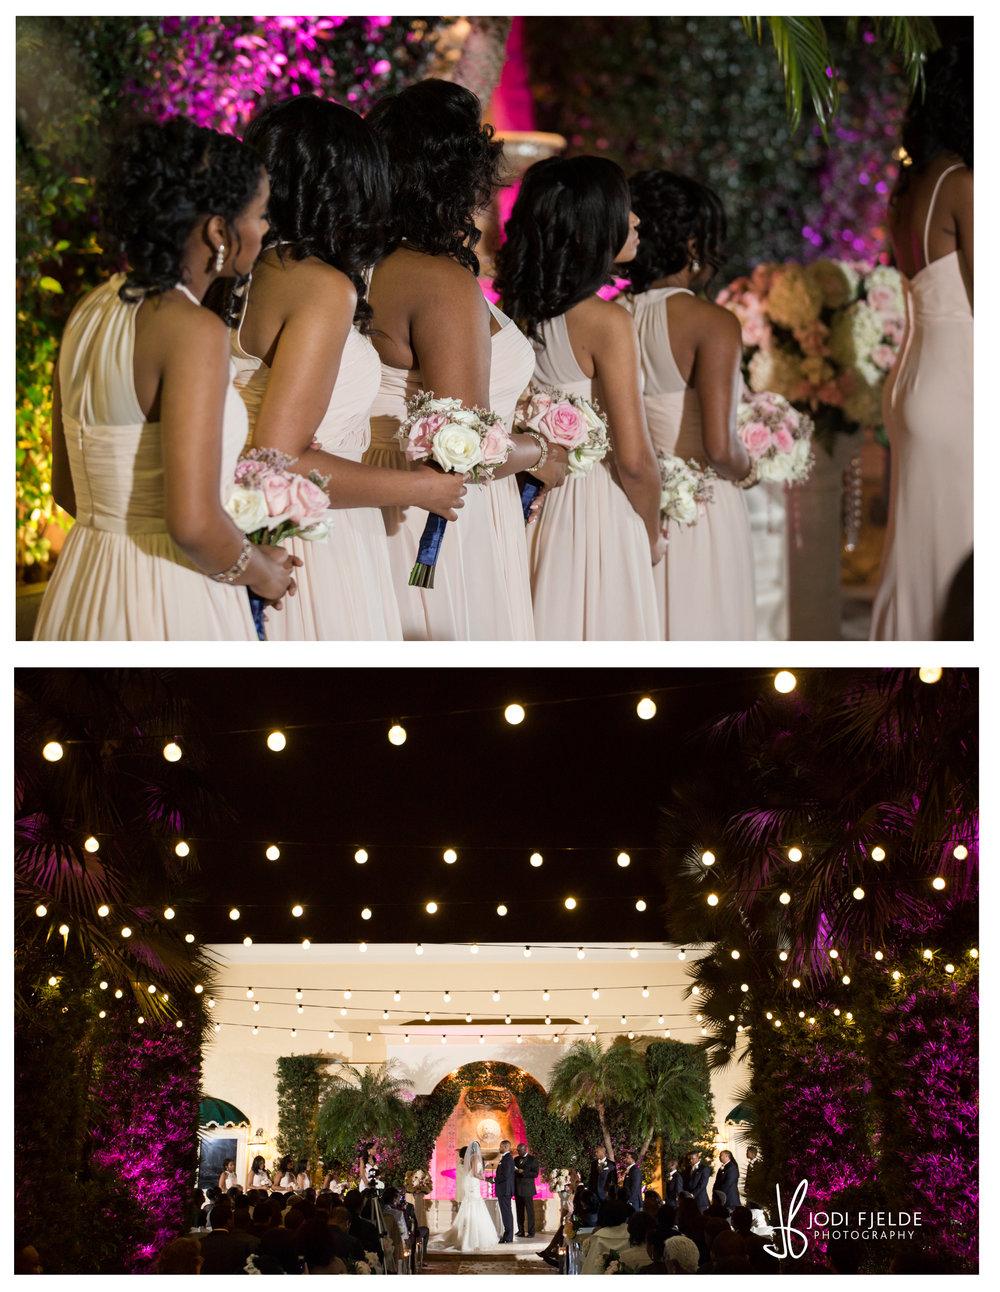 Benvenuto_wedding_Boynton_Beach_Jodi_Fjelde_Photography_Nikki_Otis_married_16.jpg